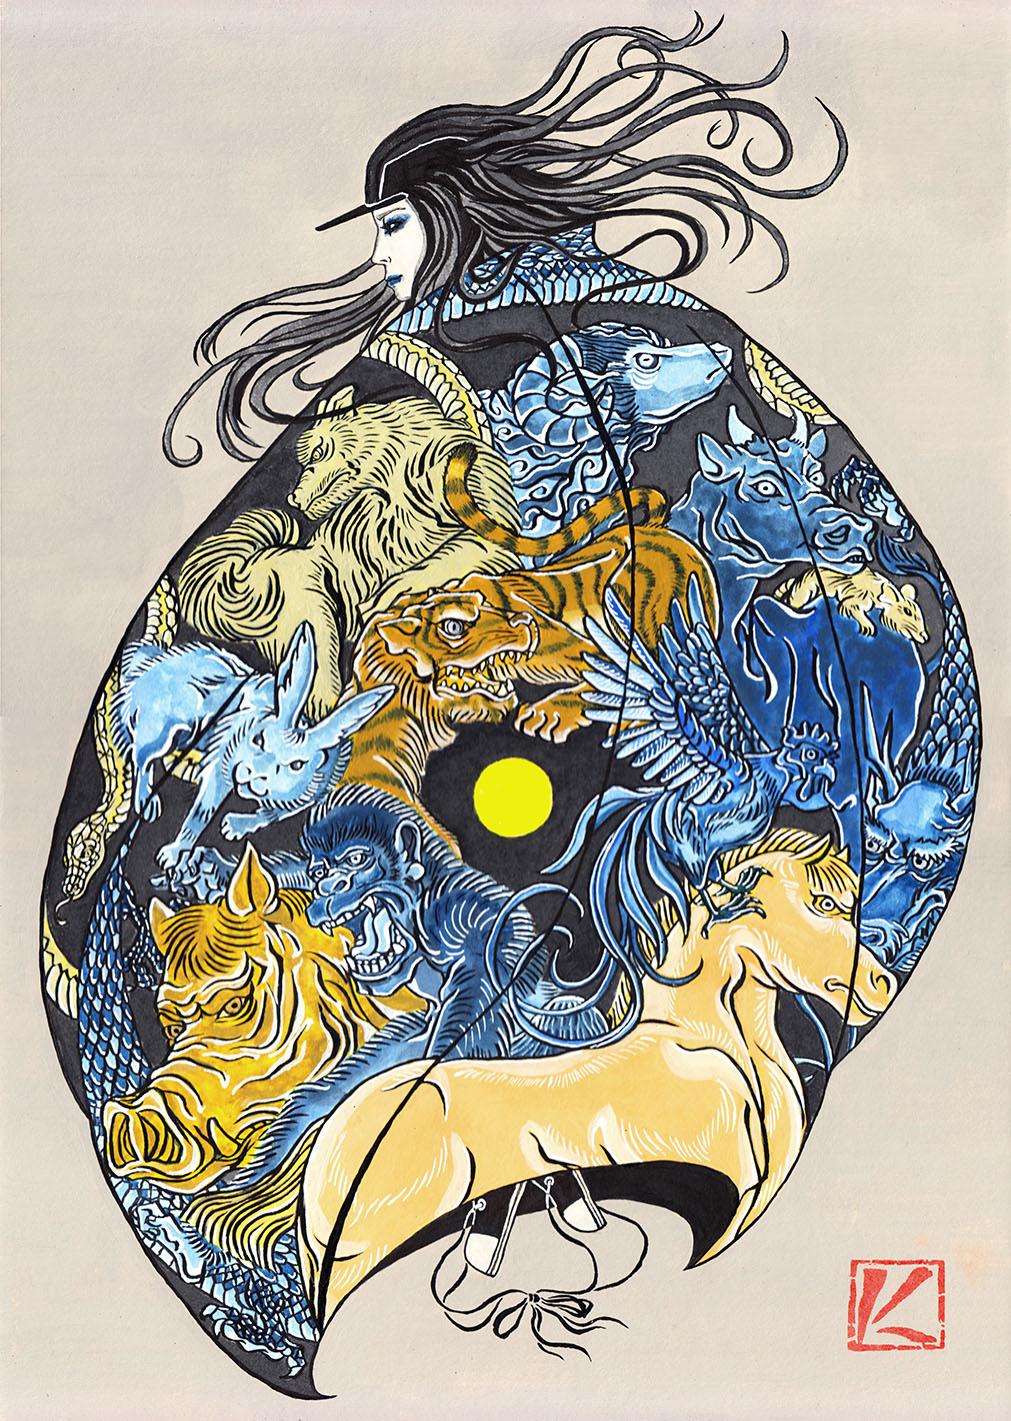 岩崎健児 Kenji Iwasaki ukiyoe artist japanese art ukiyoe ukiyoeart tatto uiyoe art japanese artist japanese traditional artist japanese traditional artist